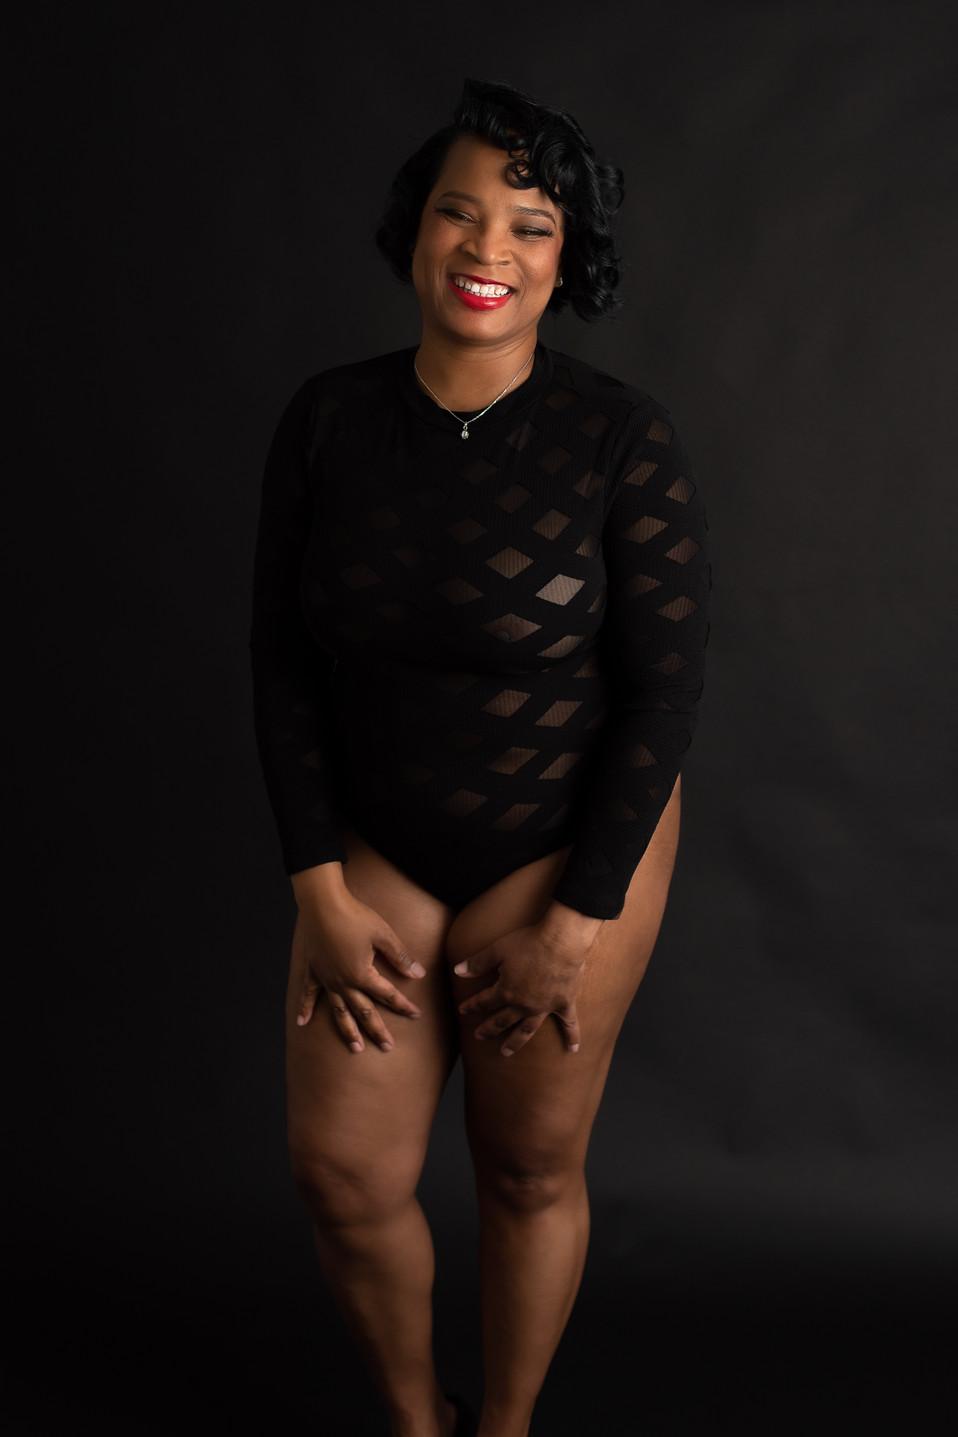 boudoir photographer metro detroit